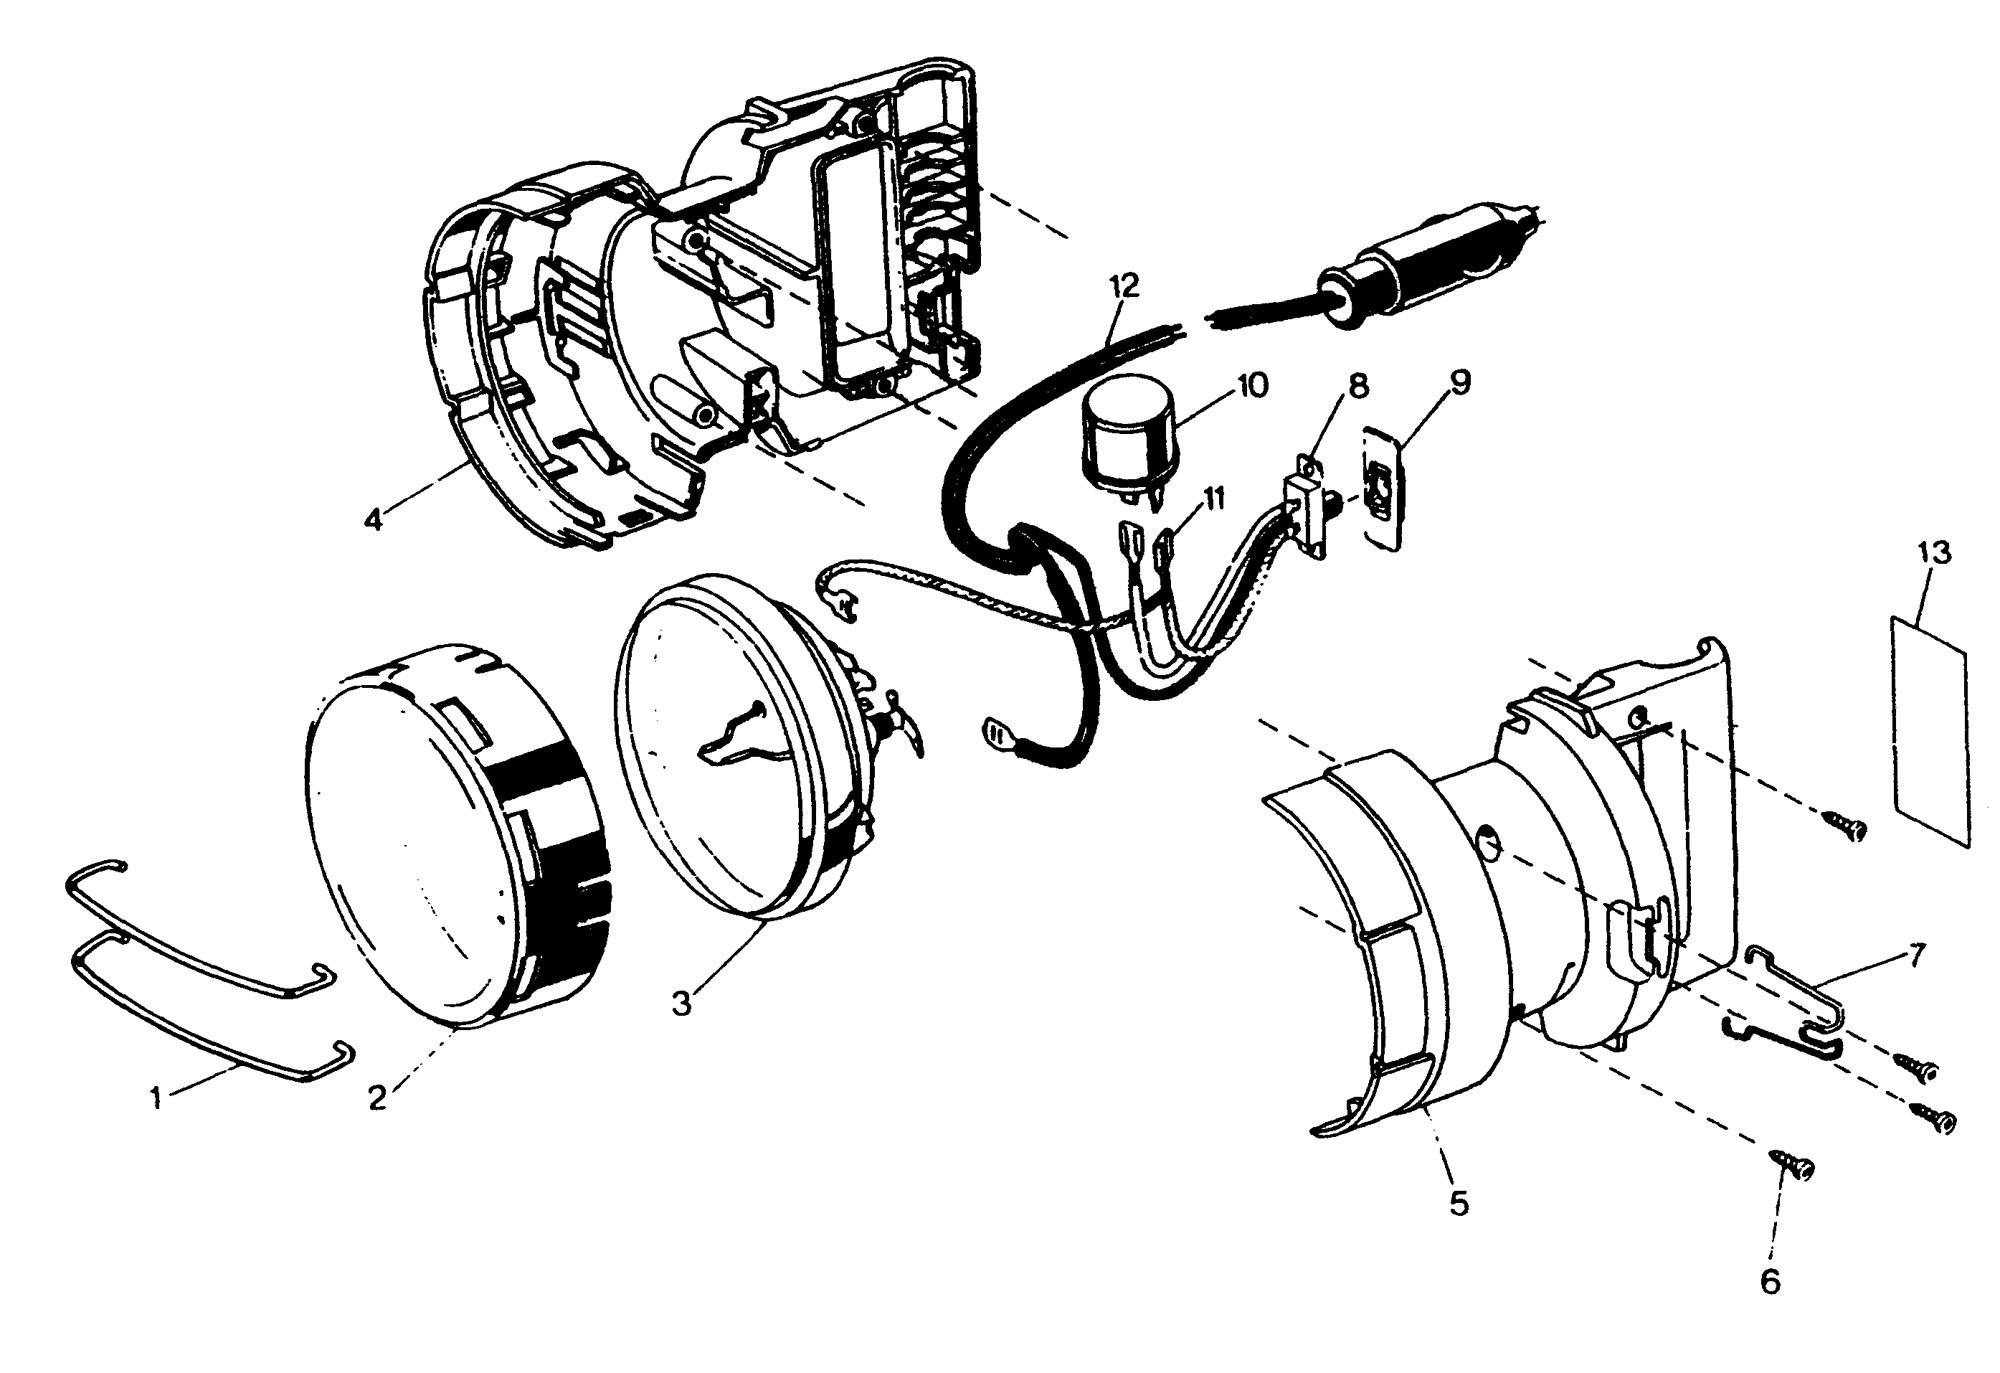 Spares For Black Amp Decker Car Light Type 1 Spare